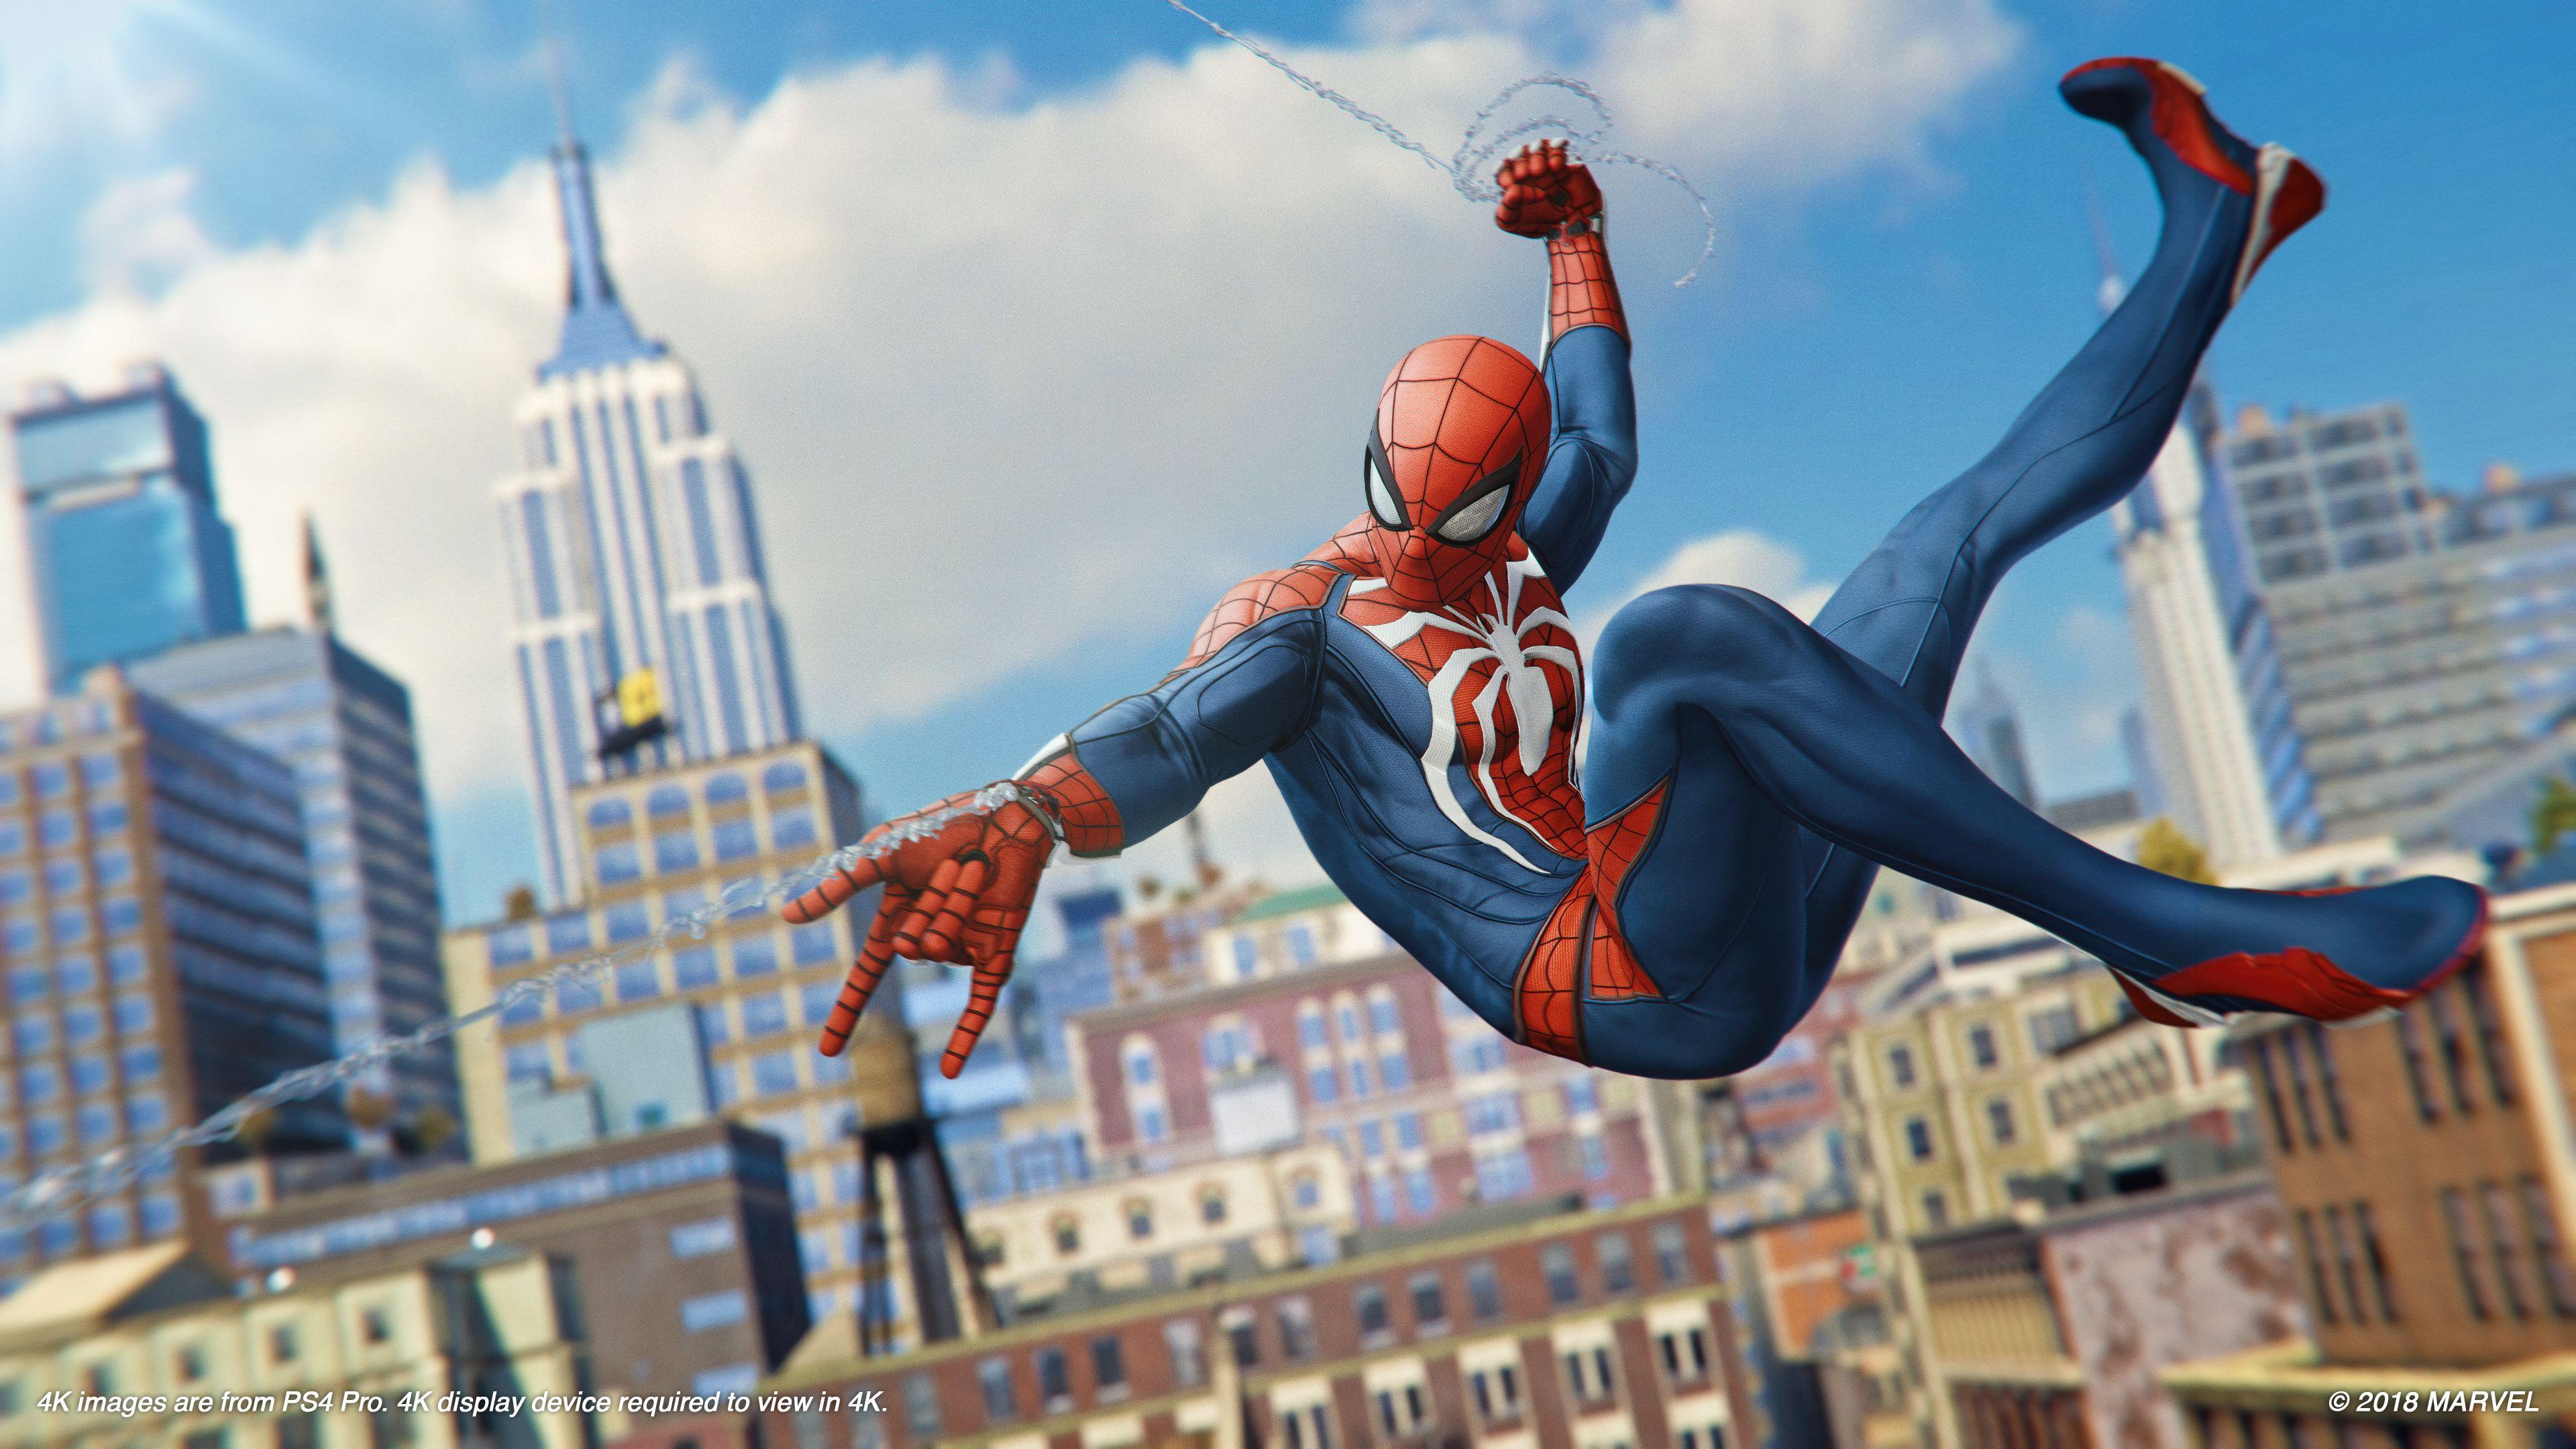 Marvels Spiderman Wallpapers - Wallpaper Cave